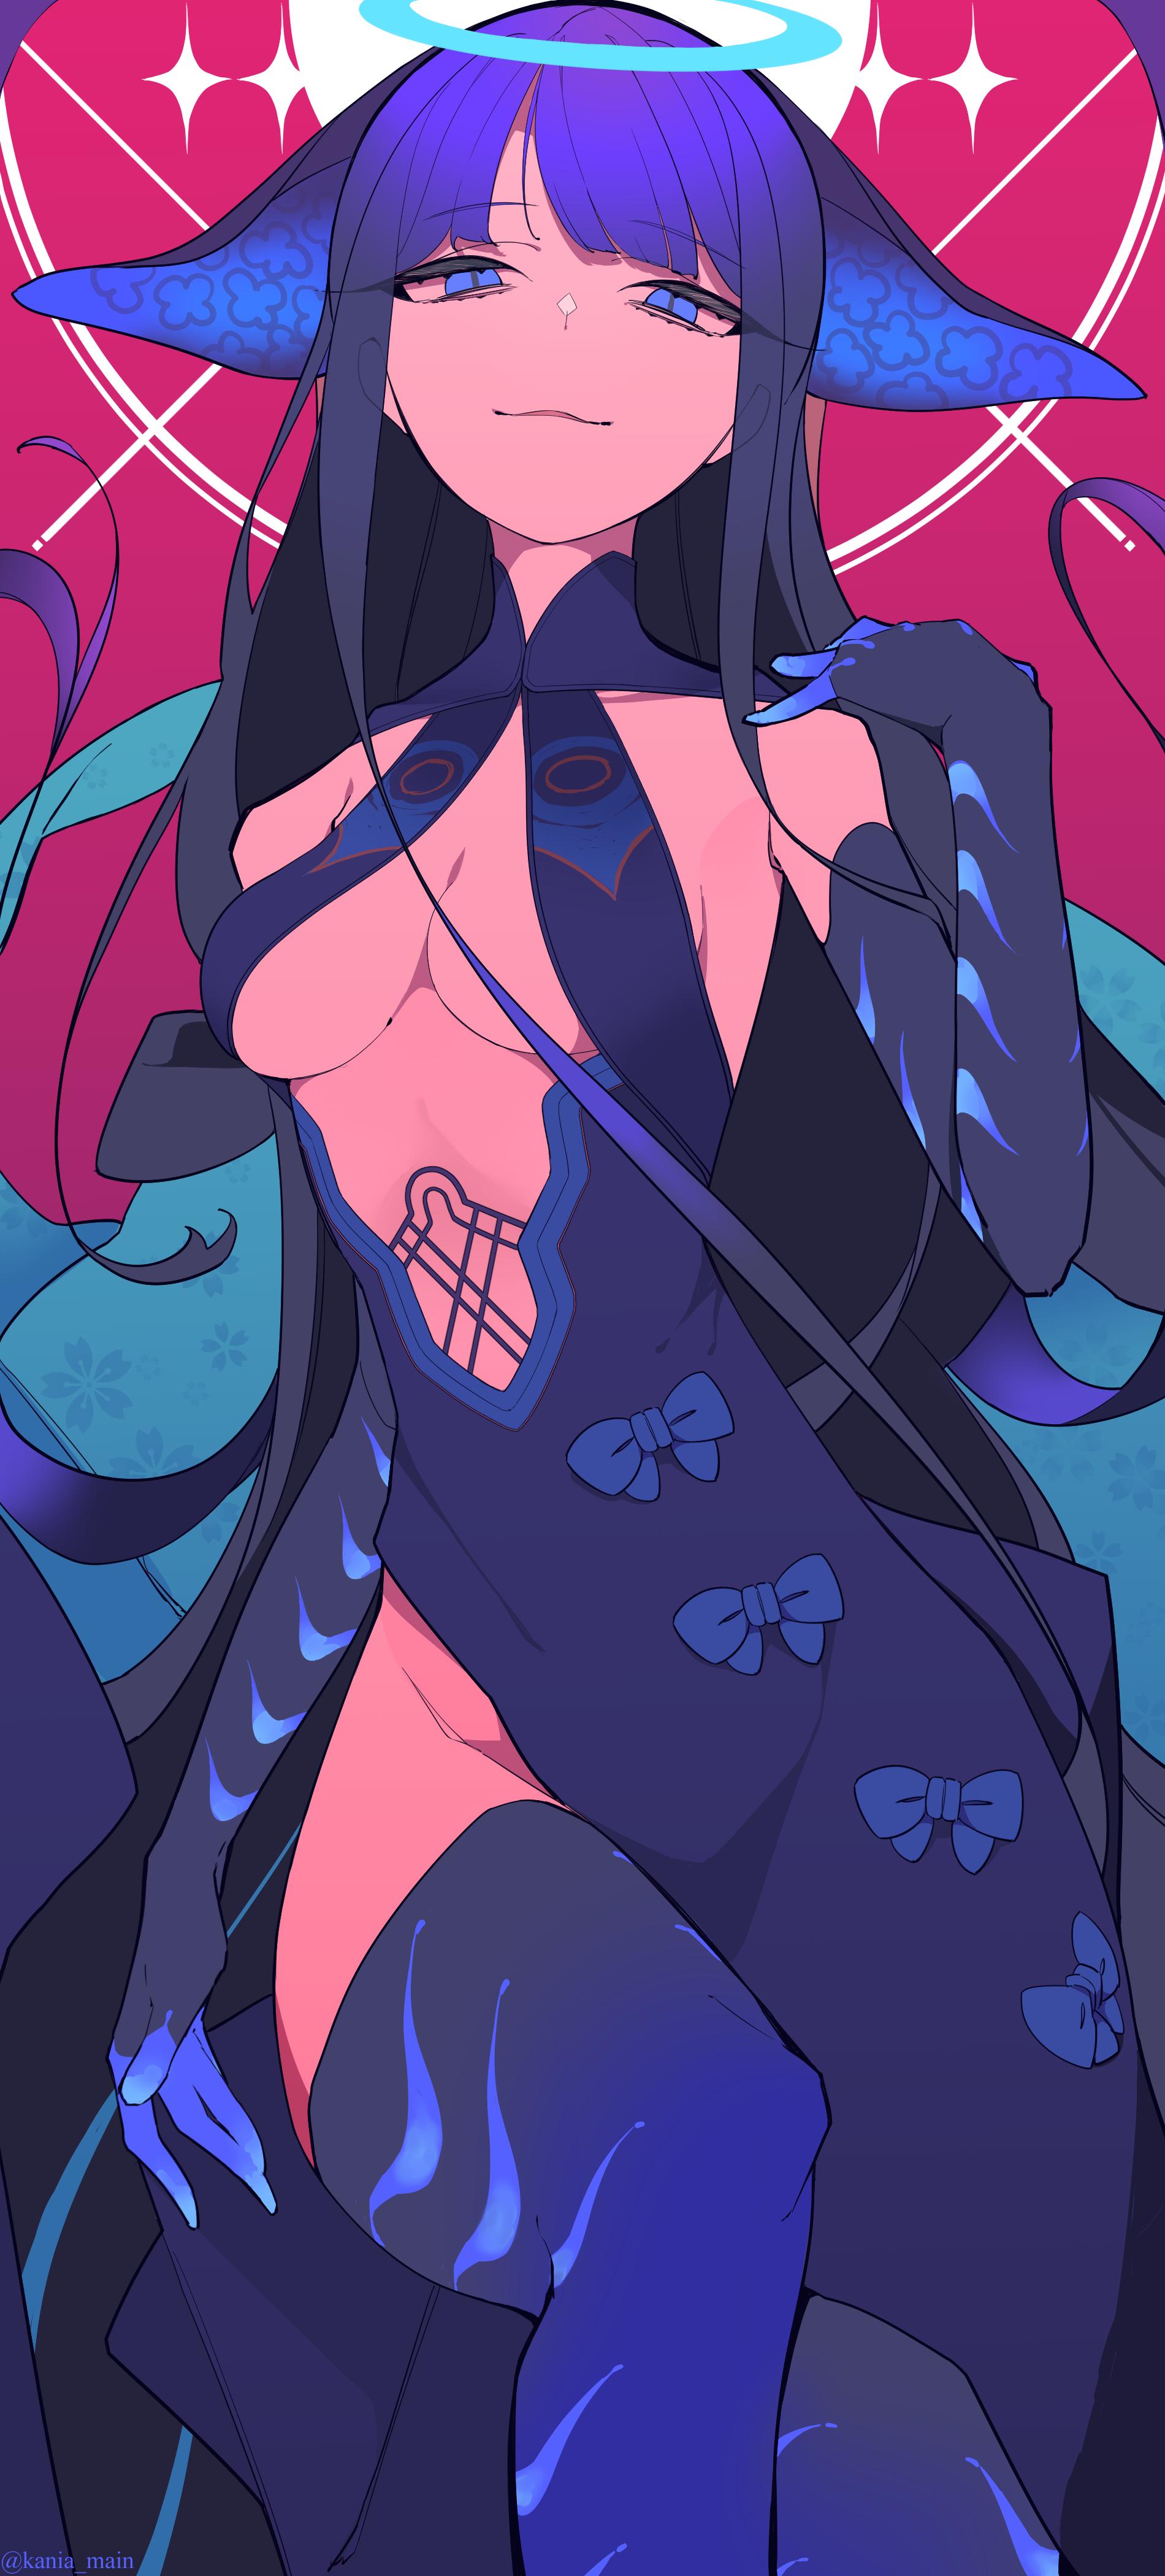 Anime 1900x4200 anime anime girls digital art artwork 2D portrait display vertical boobs blue eyes purple hair Chinese dress no bra cleavage Yang guifei Fate Series Fate/Grand Order Kania